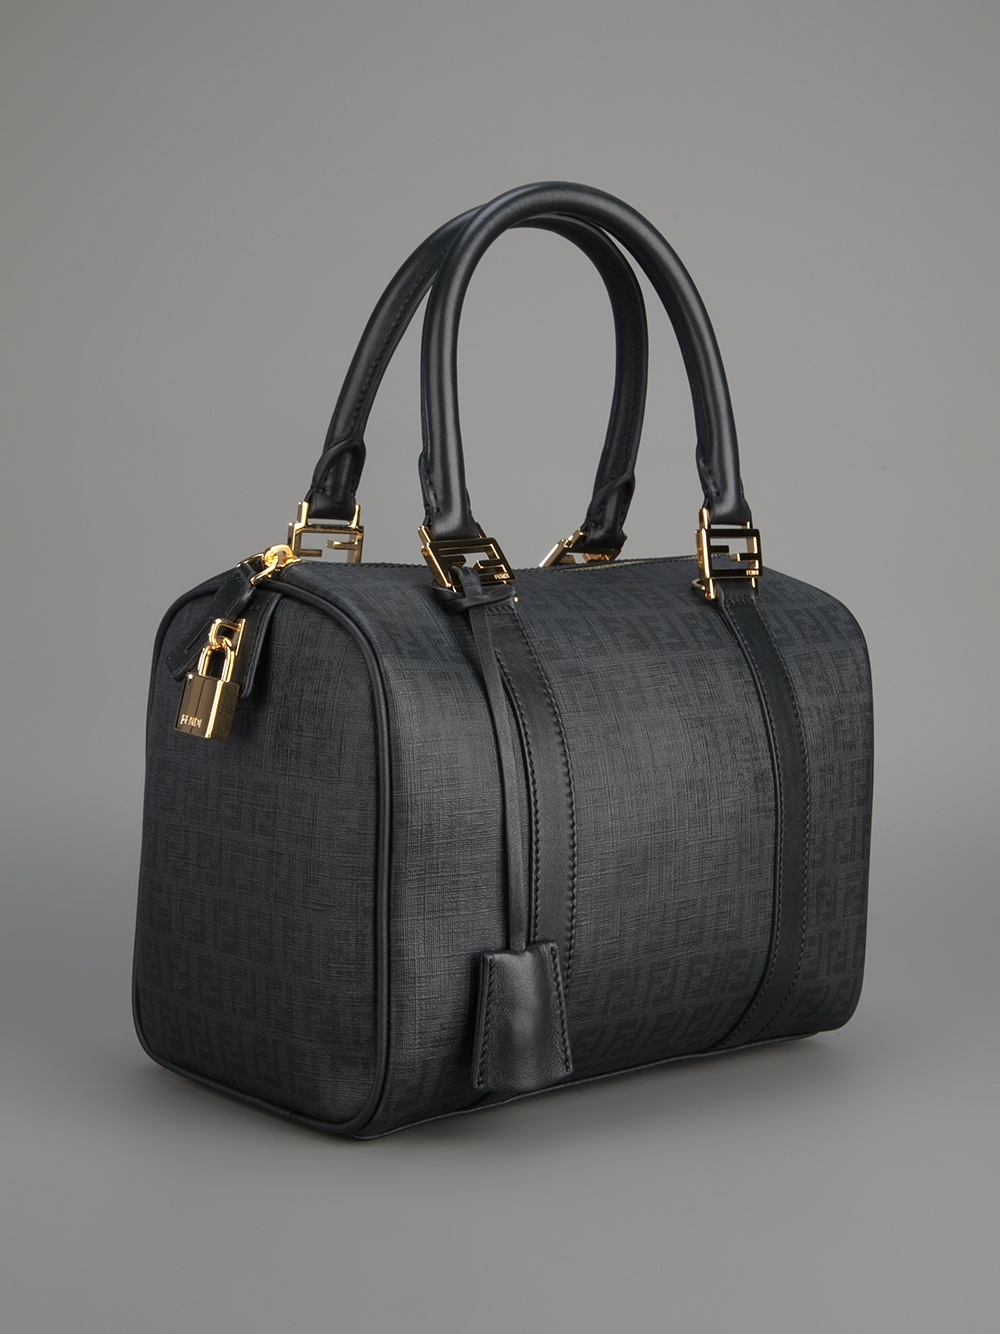 6a6d10da2225 Lyst - Fendi Logo Bowling Bag in Black